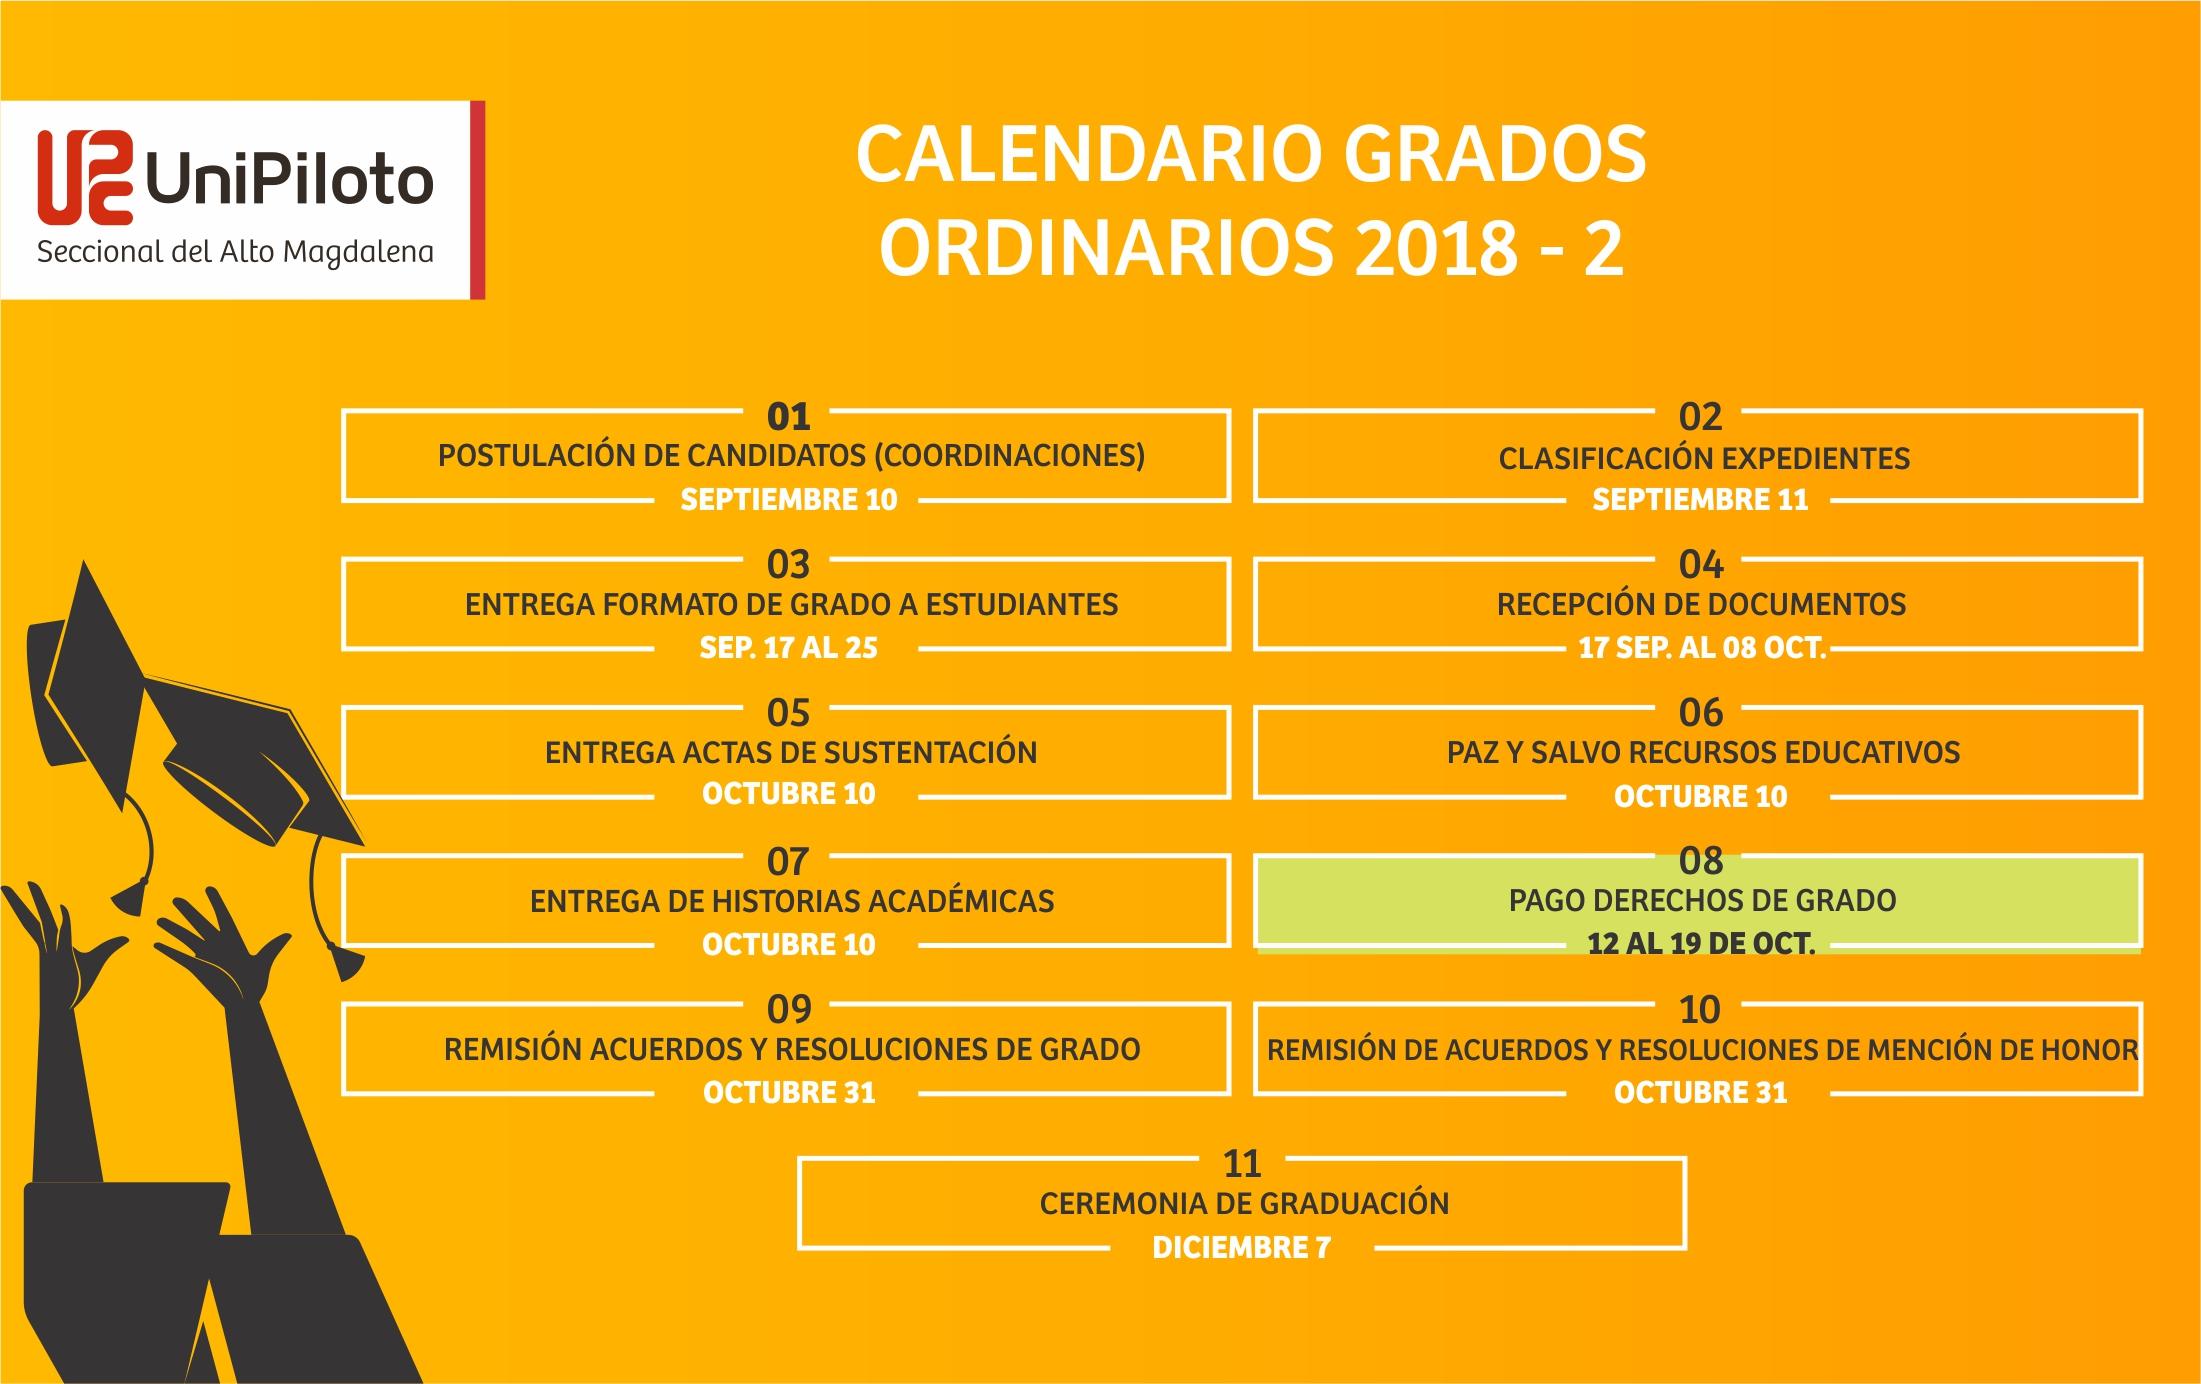 cronogramagradosii2018